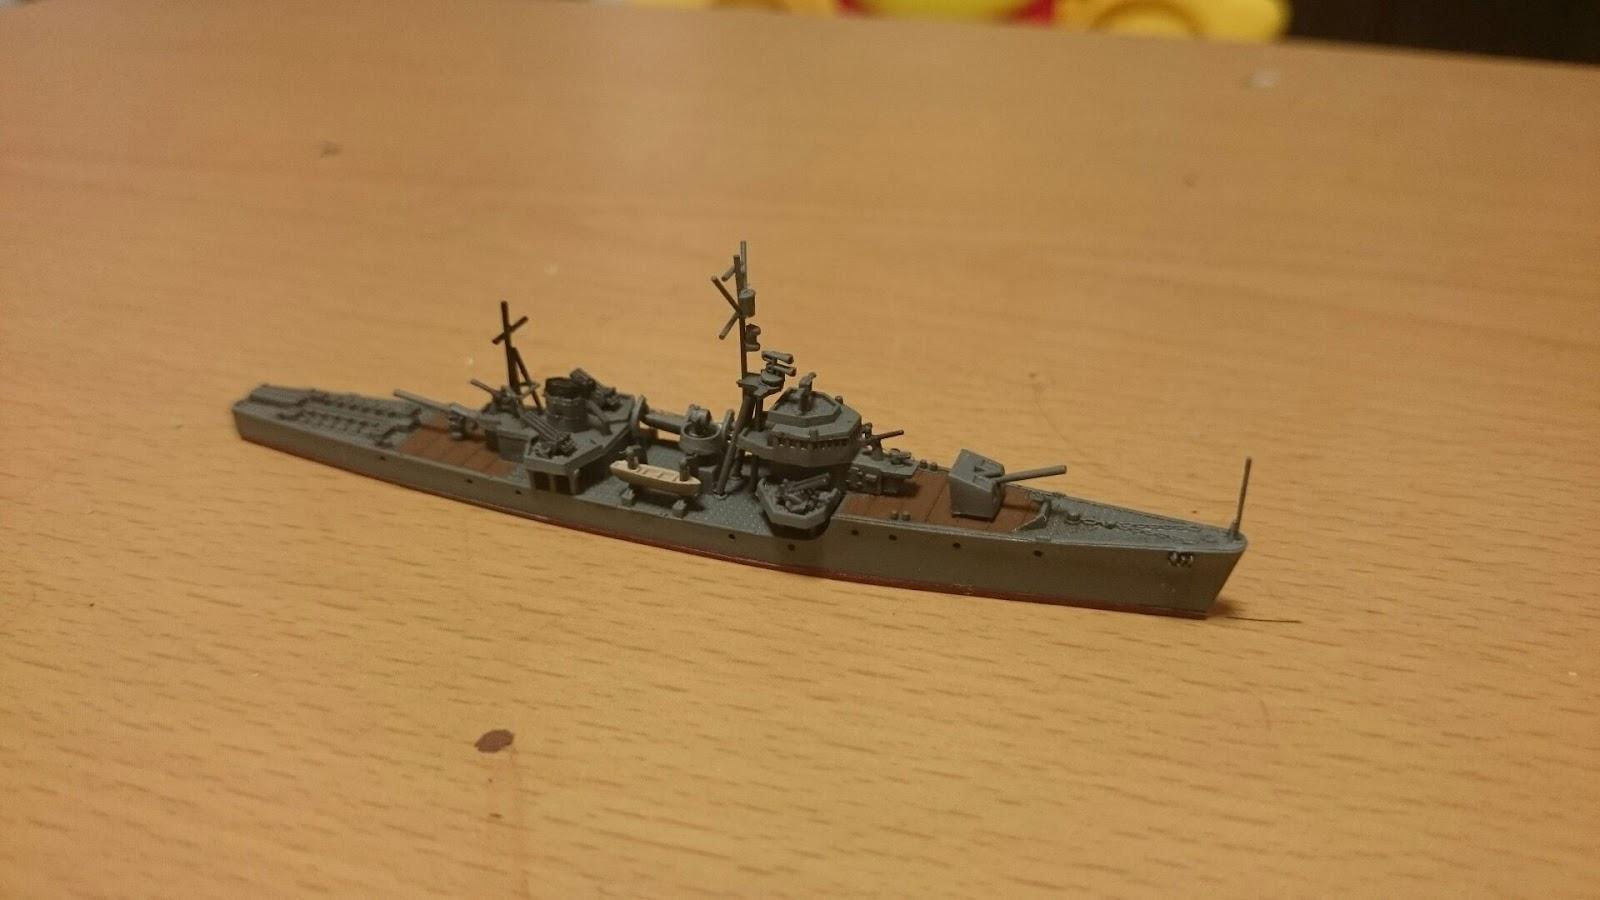 kumaの模型趣味: ピットロード 丙型海防艦 第13号海防艦 製作